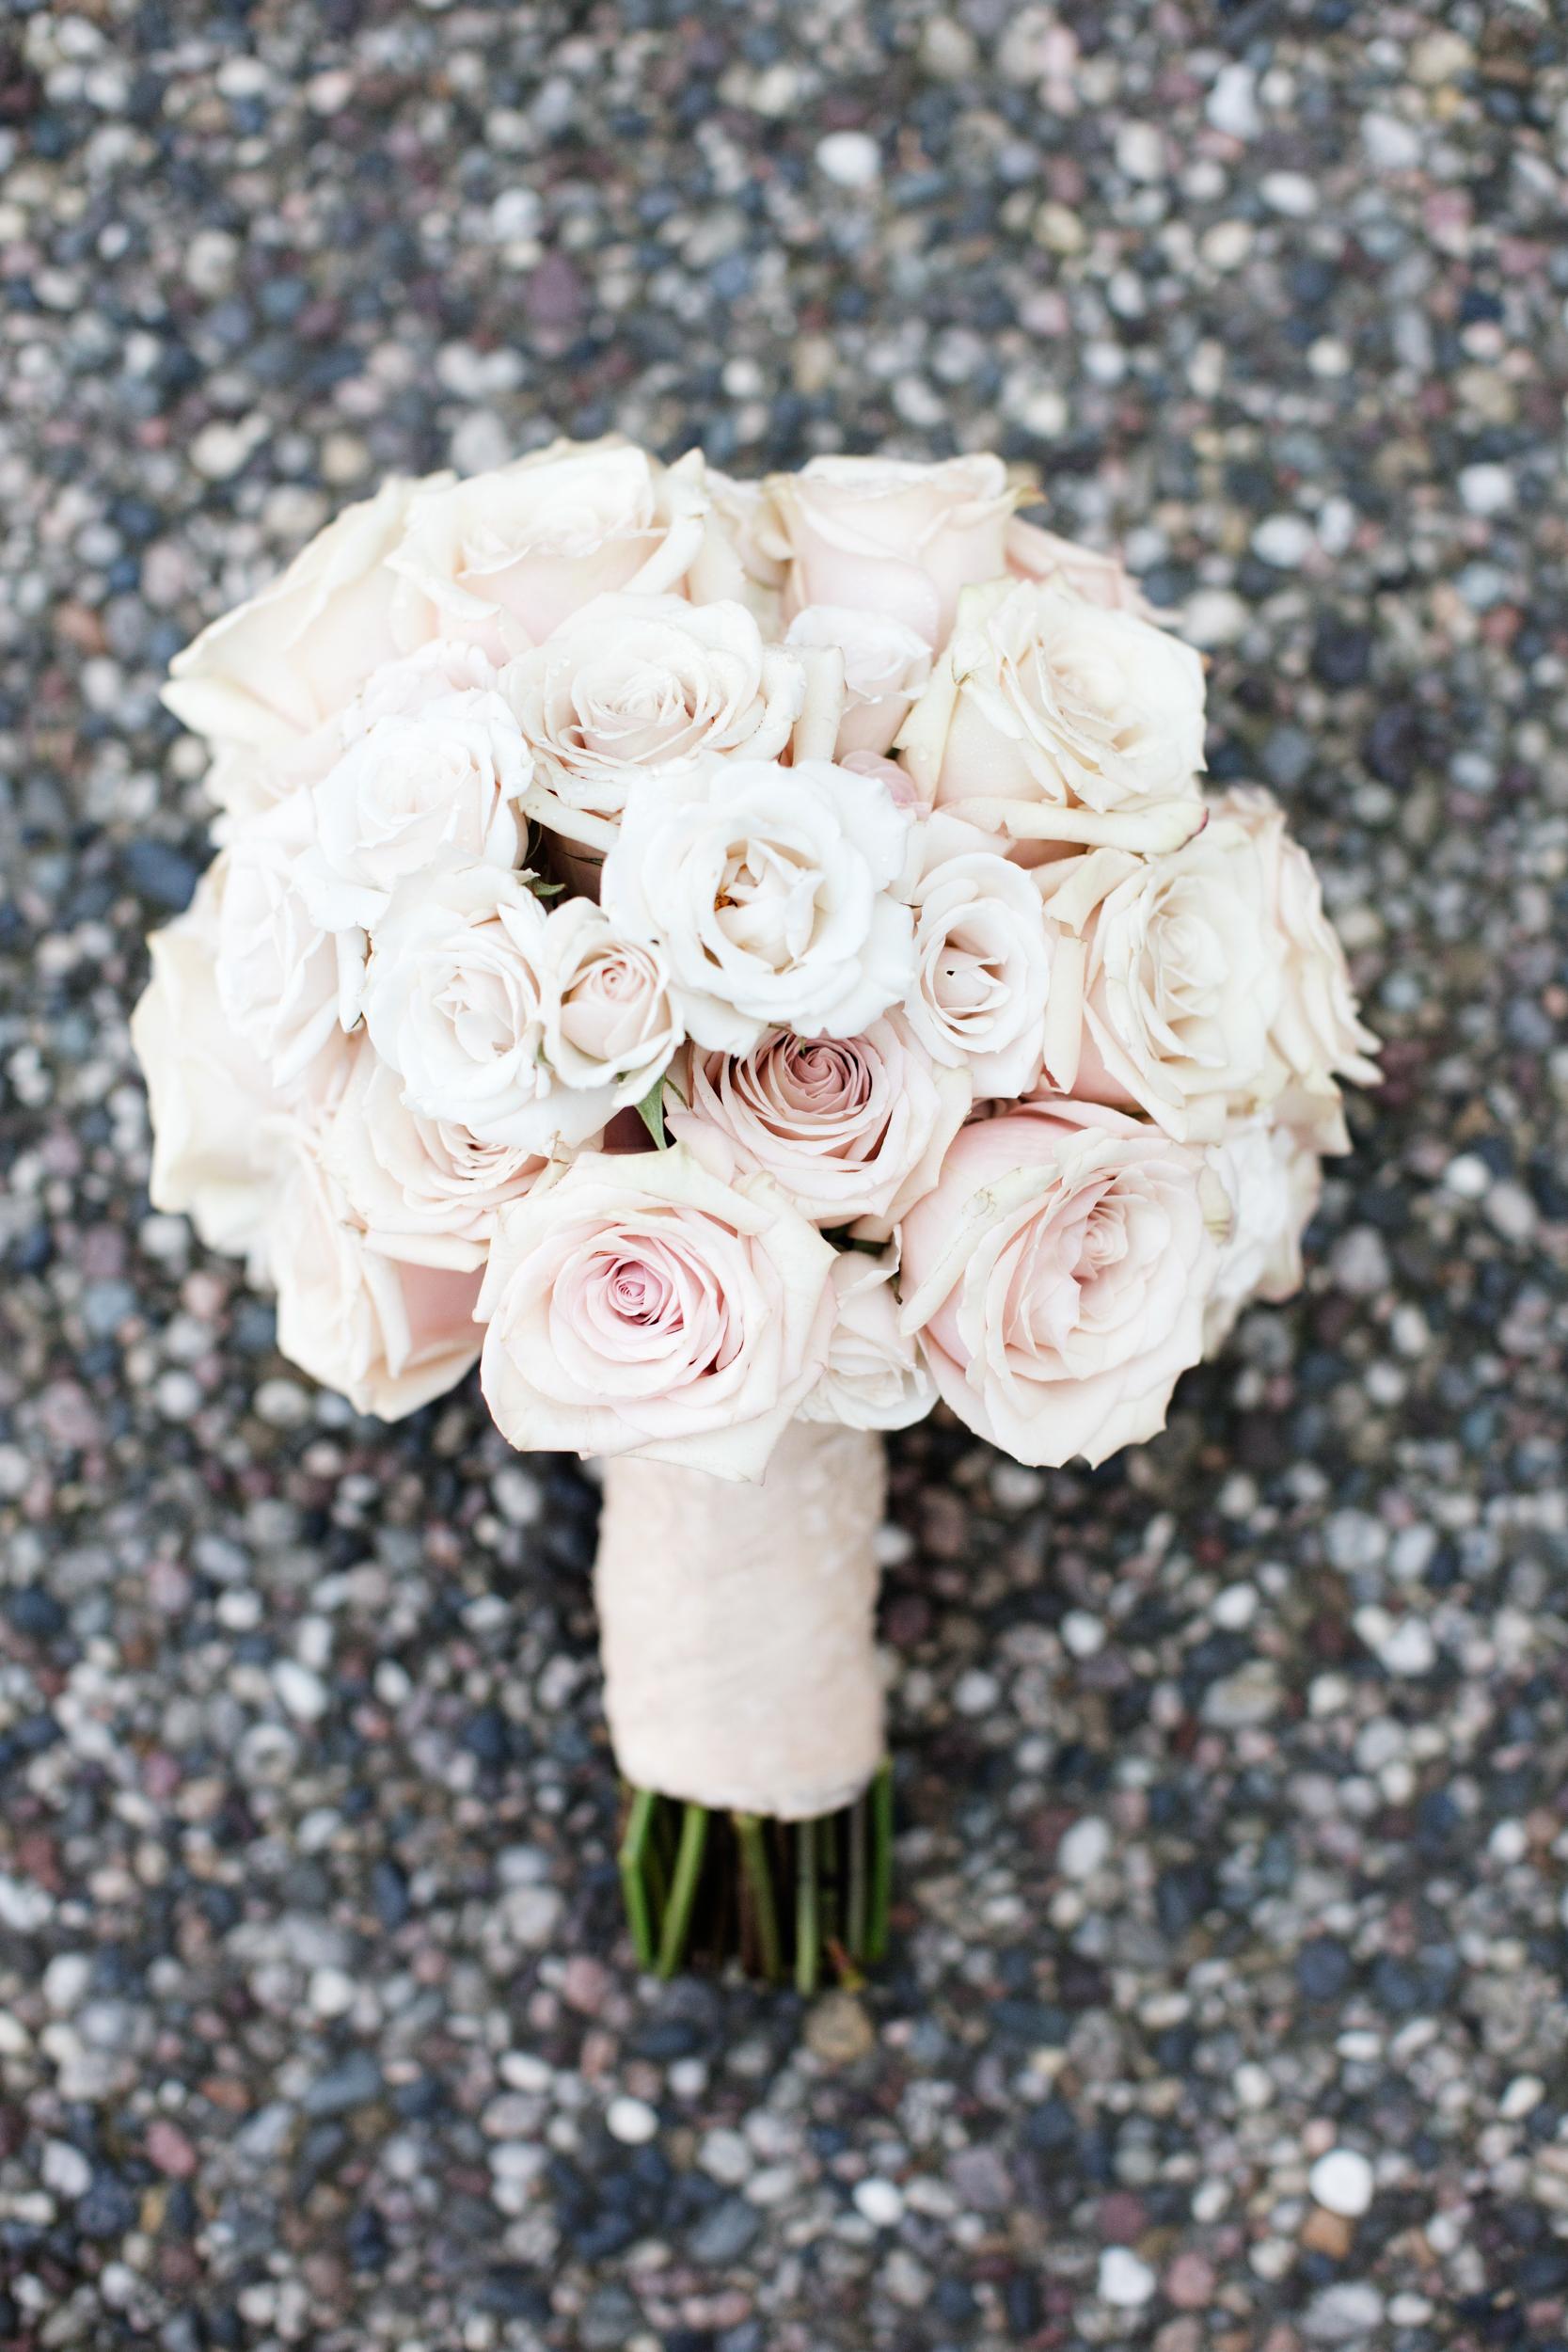 Ceci_New_York_Ceci_Style_Ceci_Johnson_Luxury_Lifestyle_Floral_Lace_Wedding_Letterpress_Inspiration_Design_Custom_Couture_Personalized_Invitations_-42.jpg